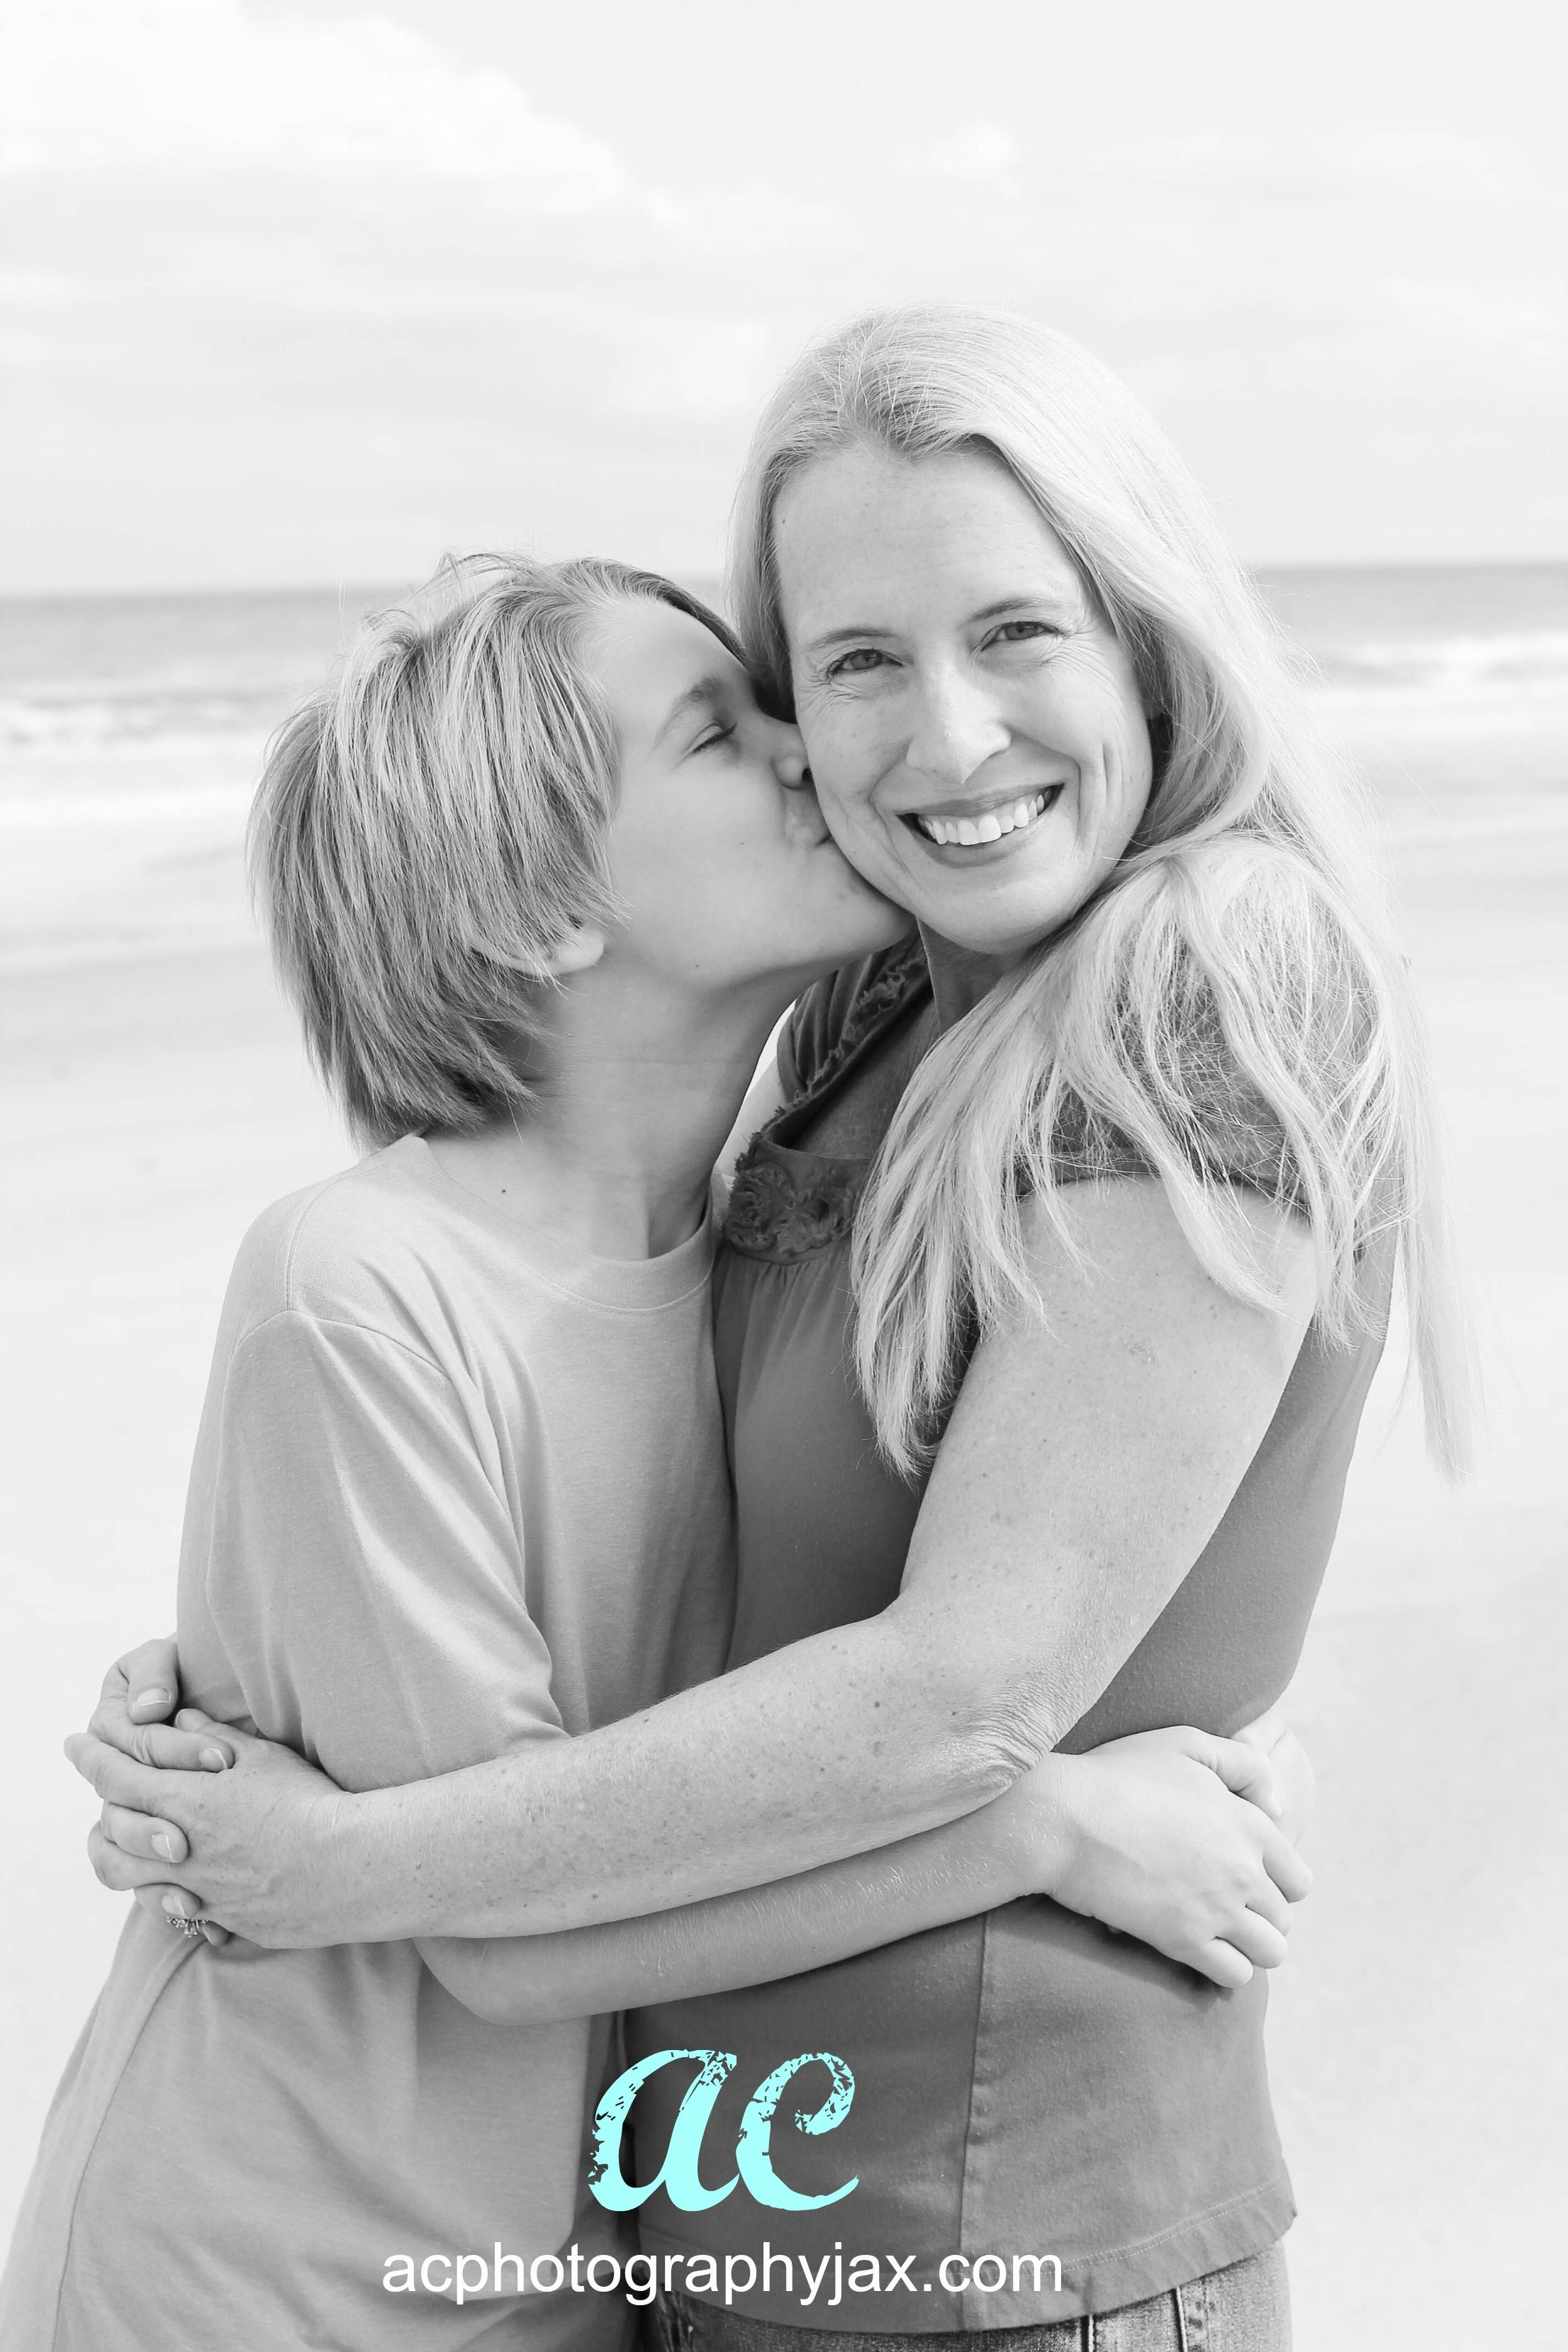 Jacksonville, FL Child & Family photographer, Amanda Chapman, AC Photography. Atlantic Beach